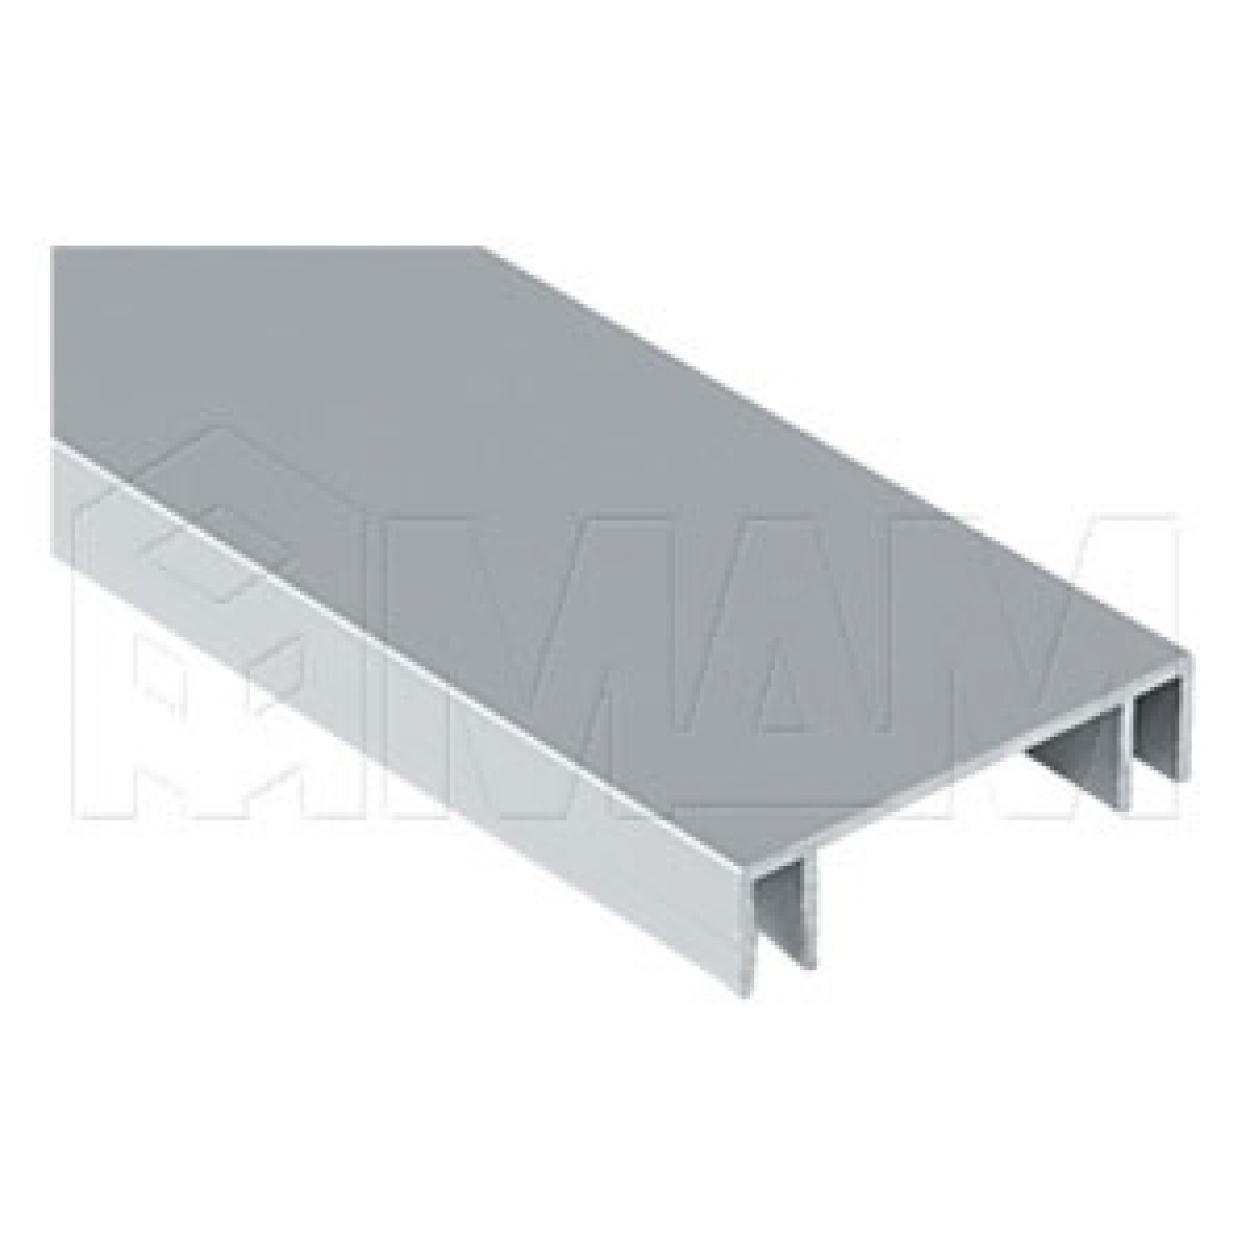 MiniCabinet Направляющая верхняя двойная, серебро, L-5500